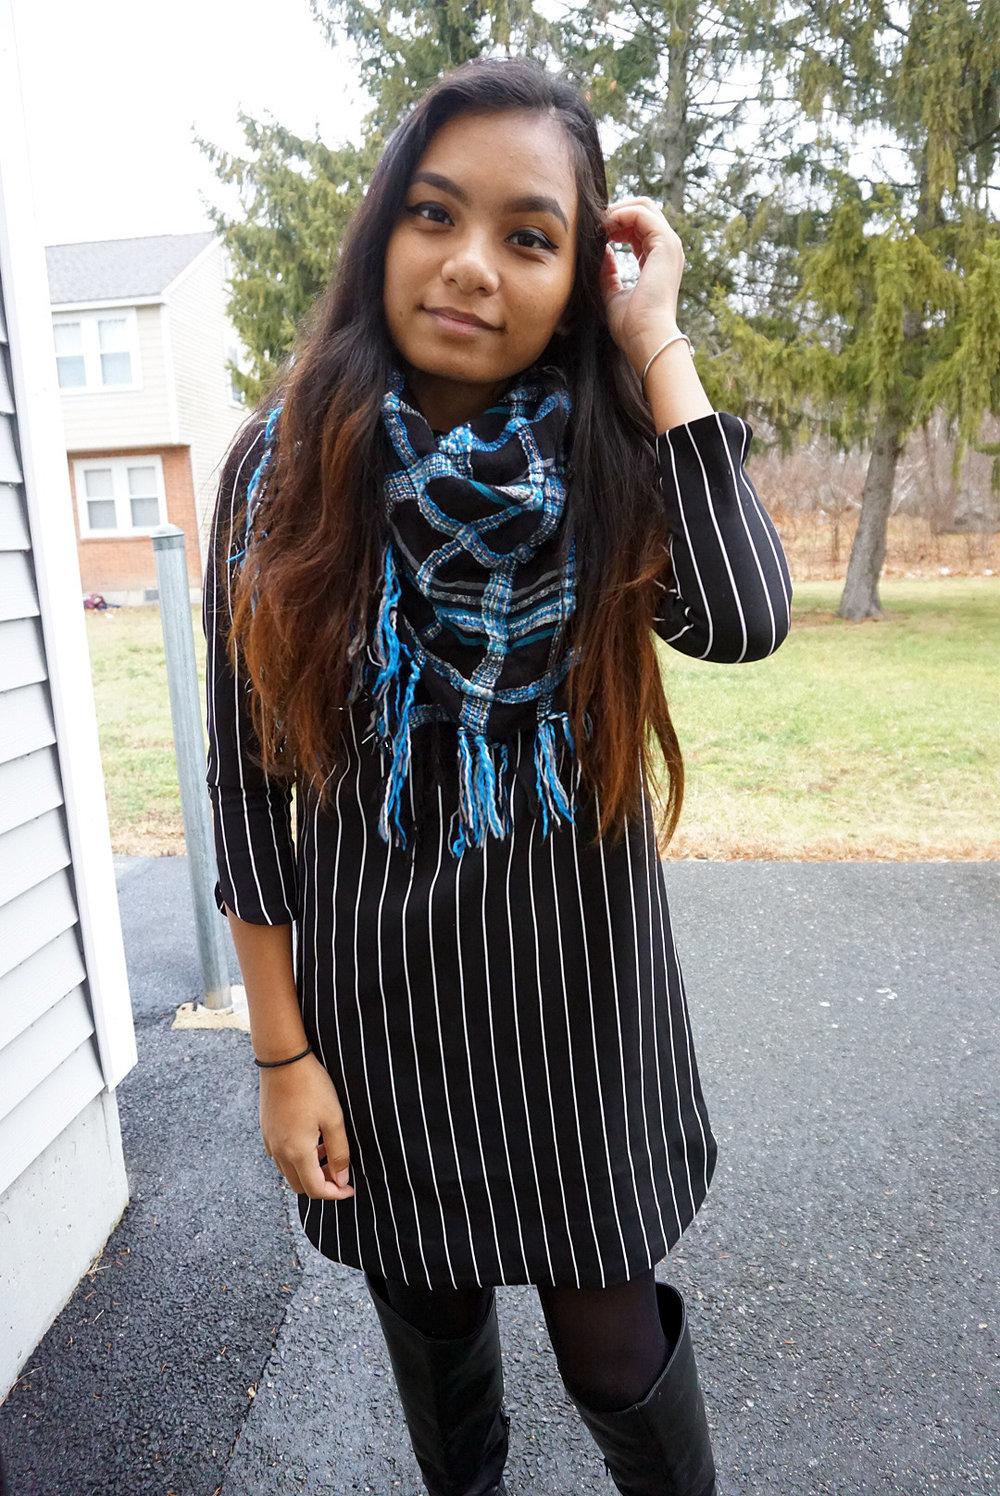 Black-White-Striped-Dress-Blogger-Style-LINDATENCHITRAN-12-1080x1616.jpg